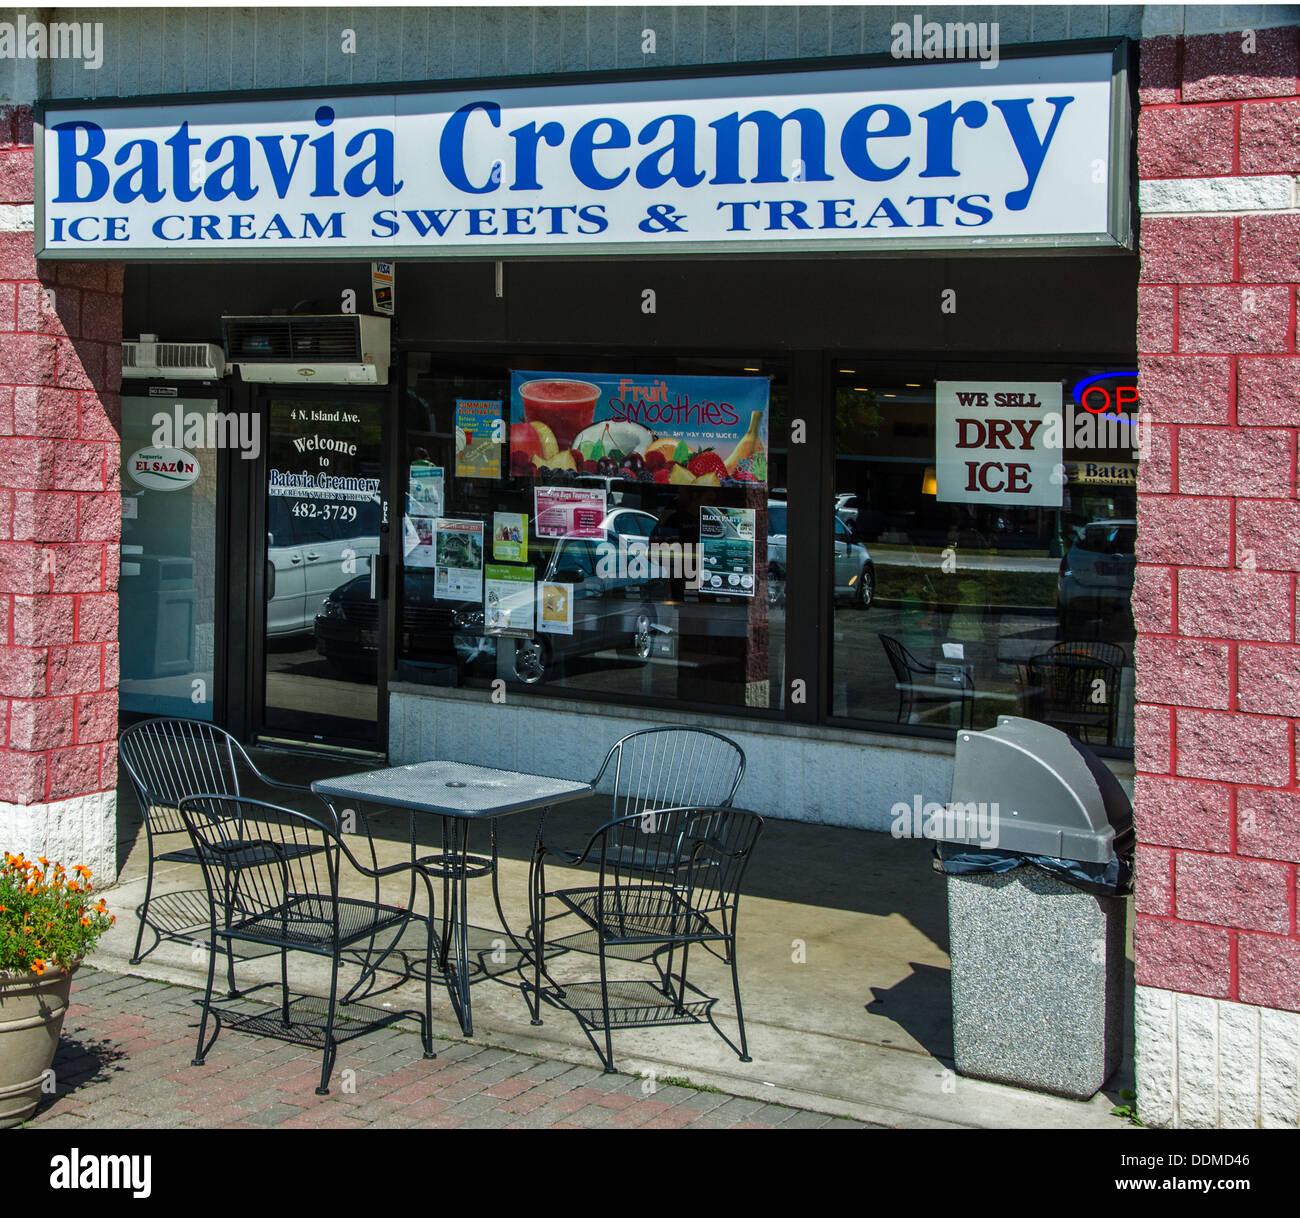 Batavia Creamery in  Batavia Illinois IL along the Lincoln Highway - Stock Image